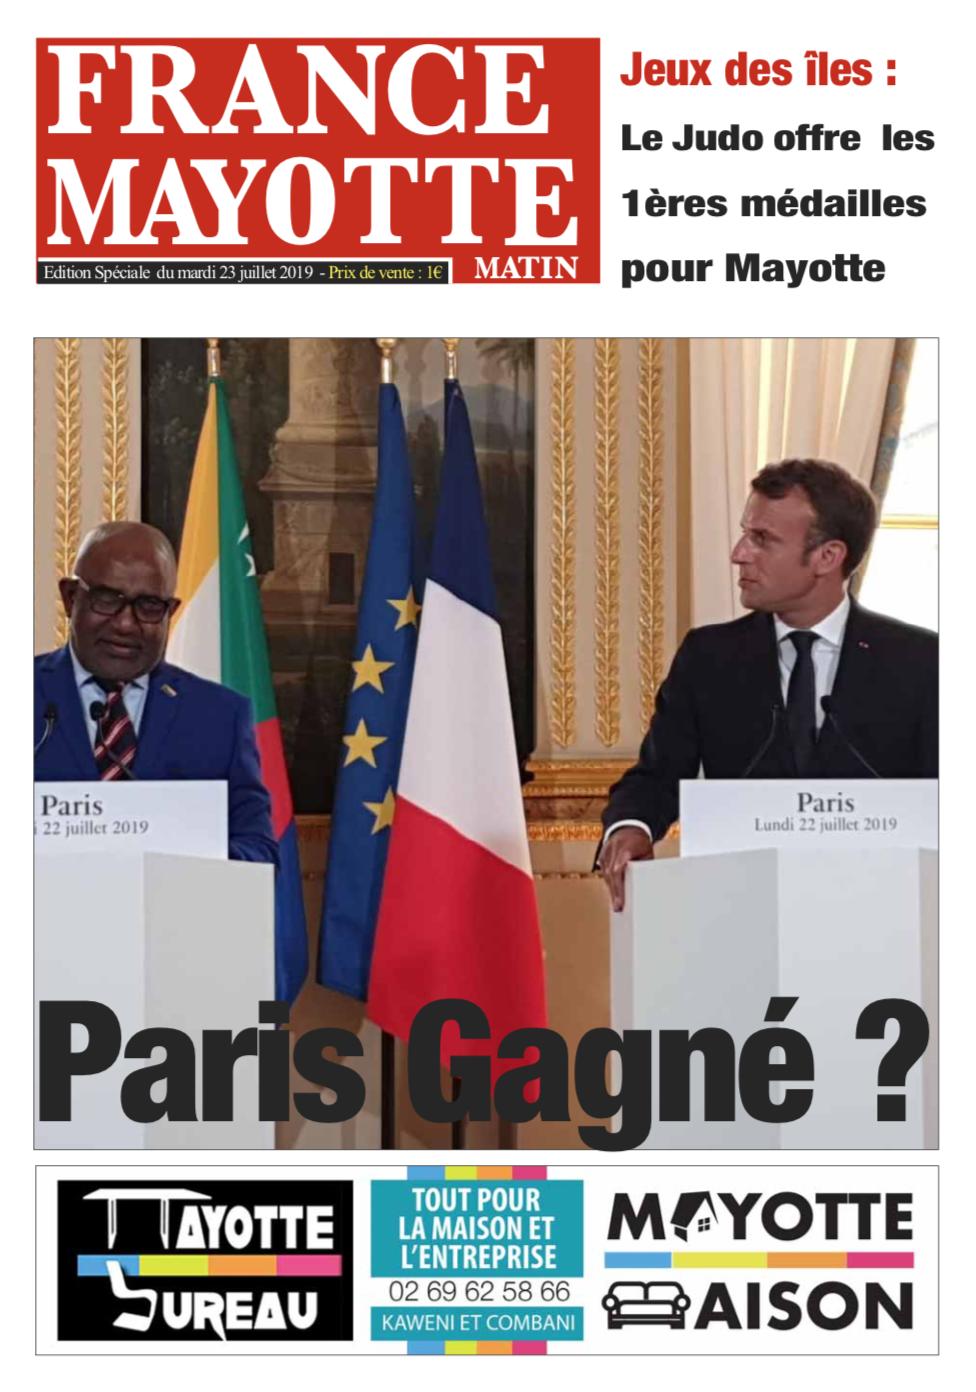 France Mayotte Mardi 23 juillet 2019